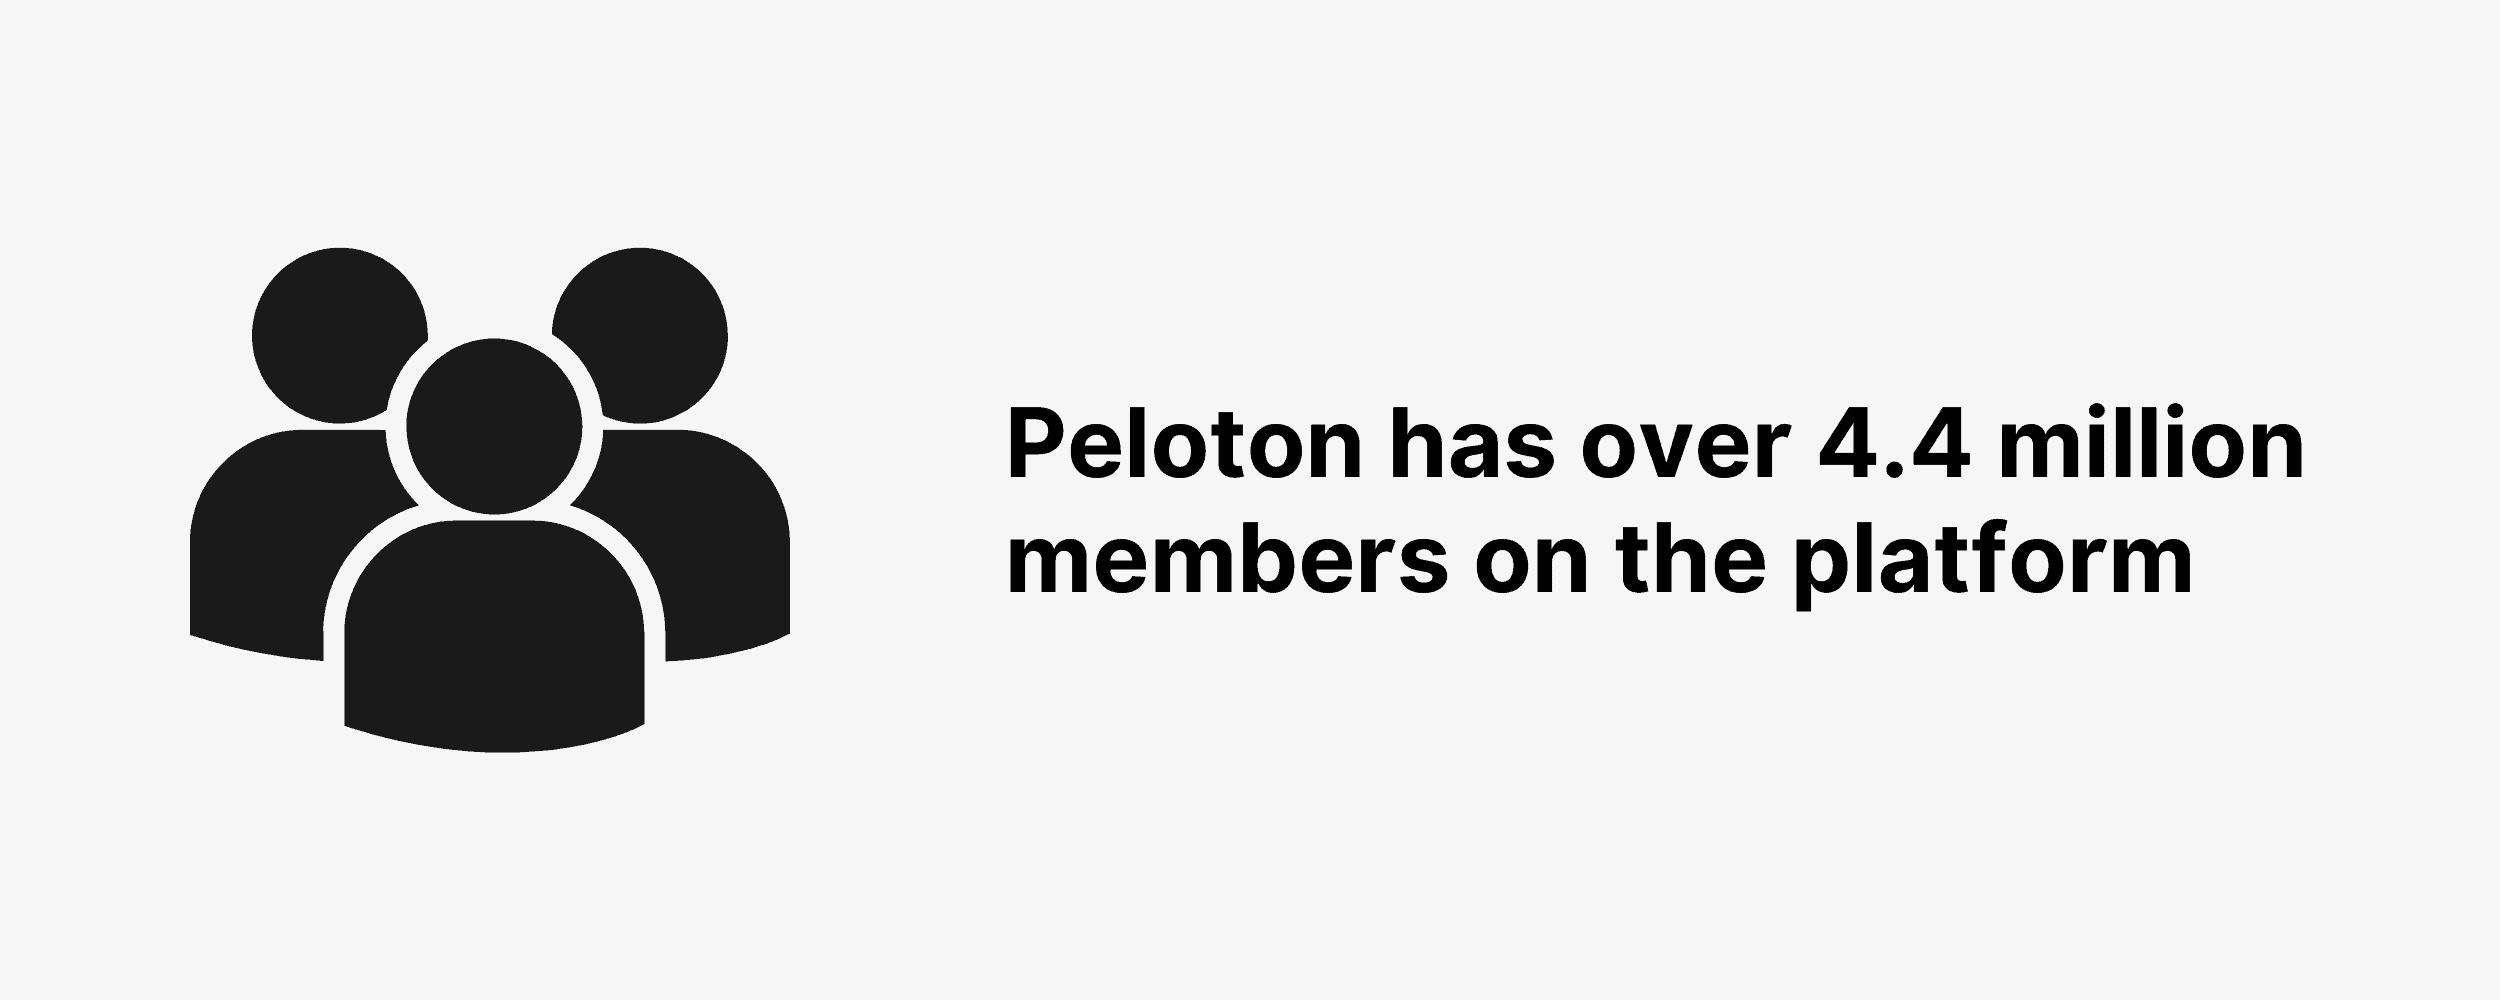 Peloton has over 4.4 million members on the platform